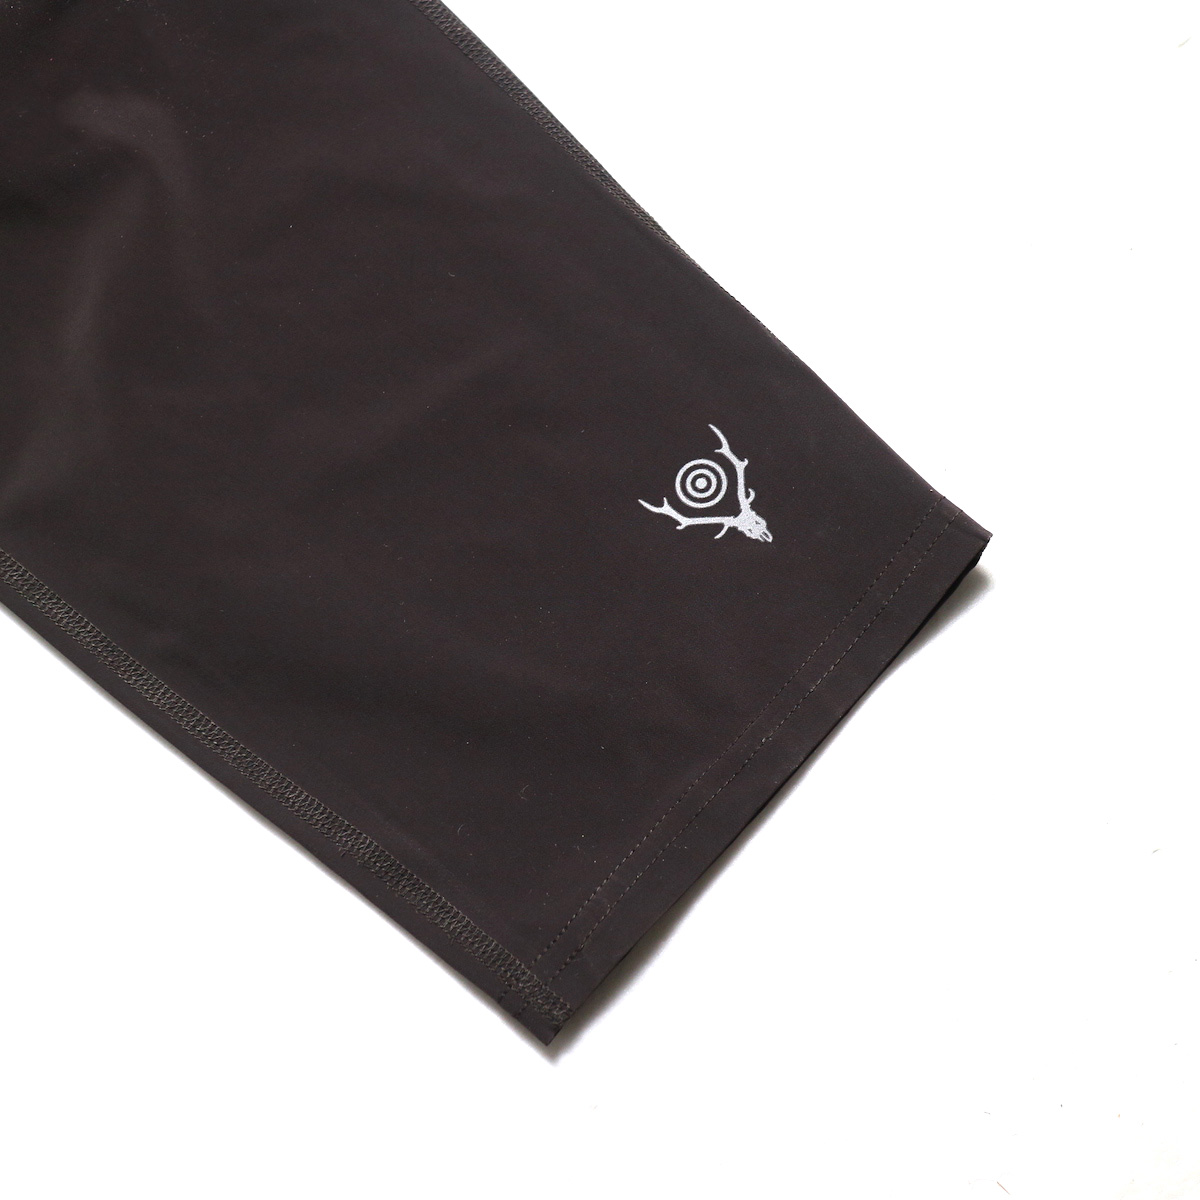 SOUTH2 WEST8 / 1P Cycle Pant-N/Pu Taffeta (Brown)  裾